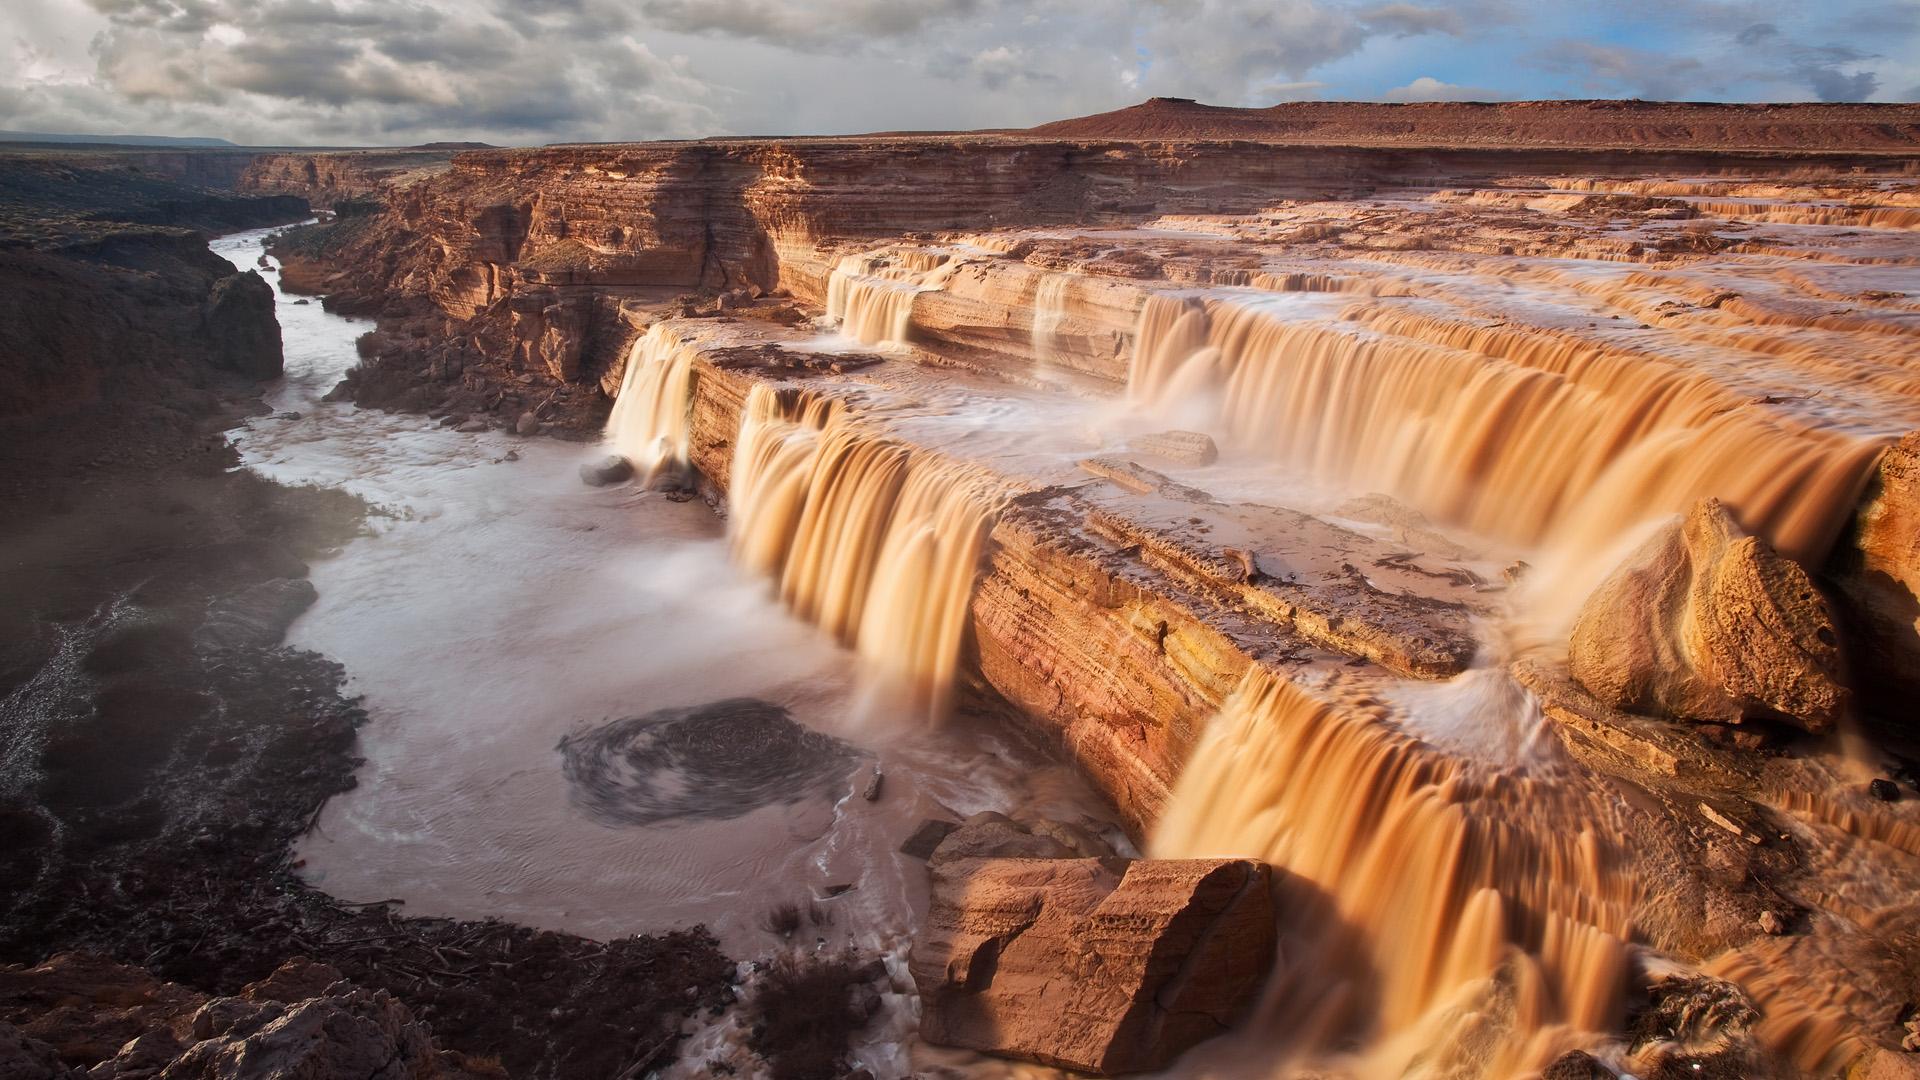 Niagara Falls Hd 1080p Wallpapers Grand Falls Little Colorado River Arizona Hd Wallpaper